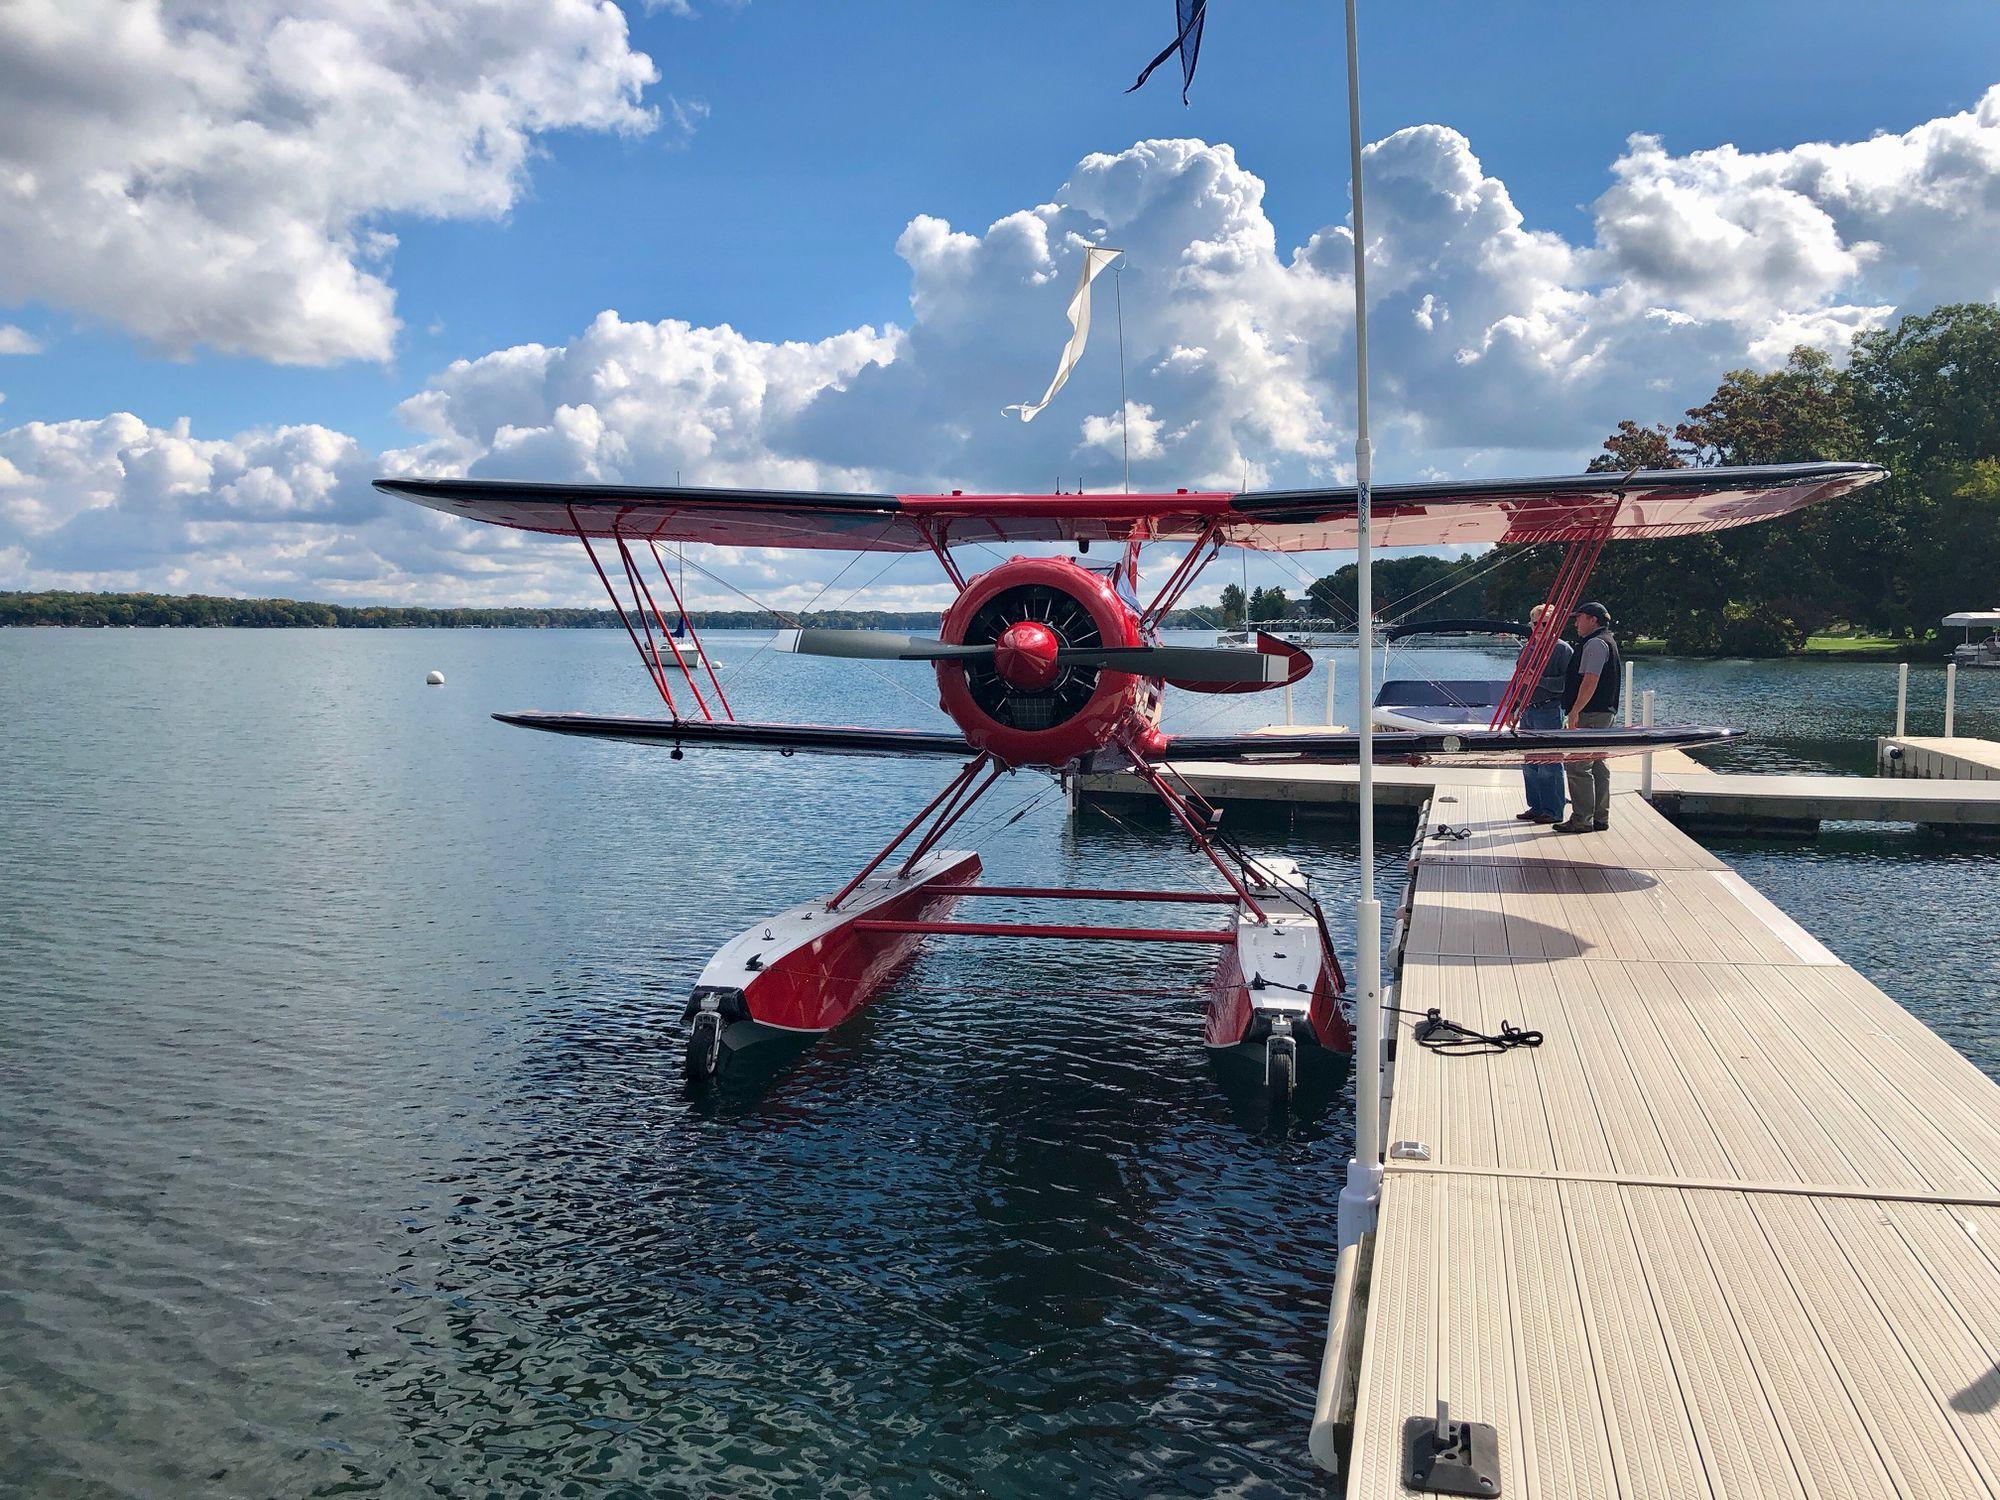 Floatplane / passenger / piston engine / 0 - 10 Pers  - WACO YMF-5F